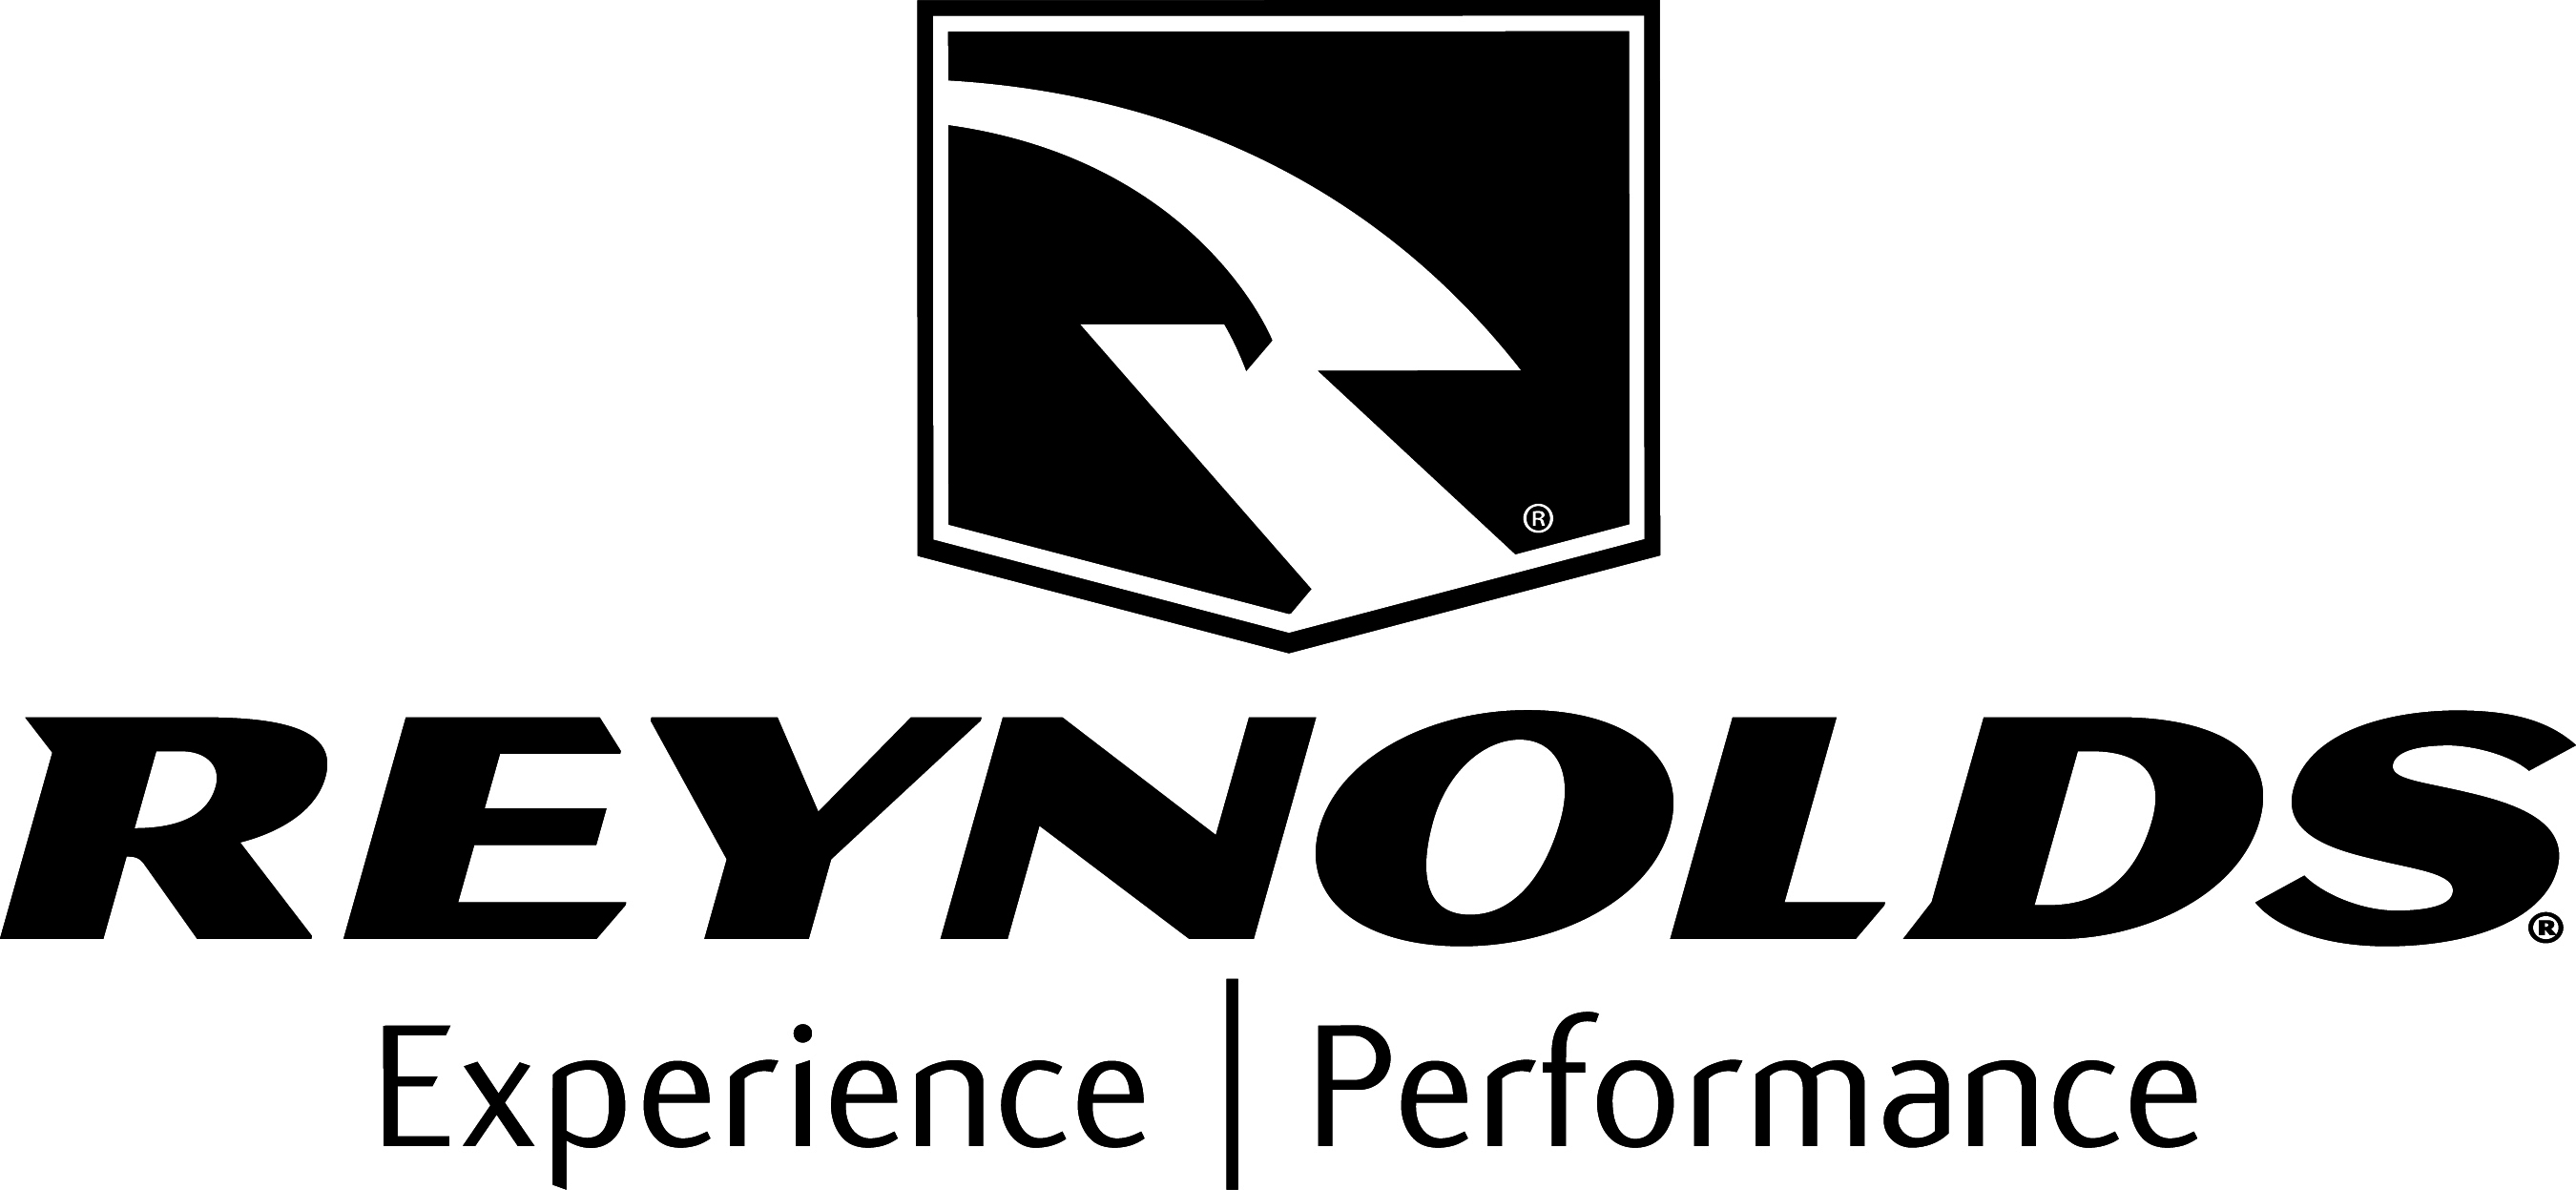 Reynolds.logo-final-vertical.black_high